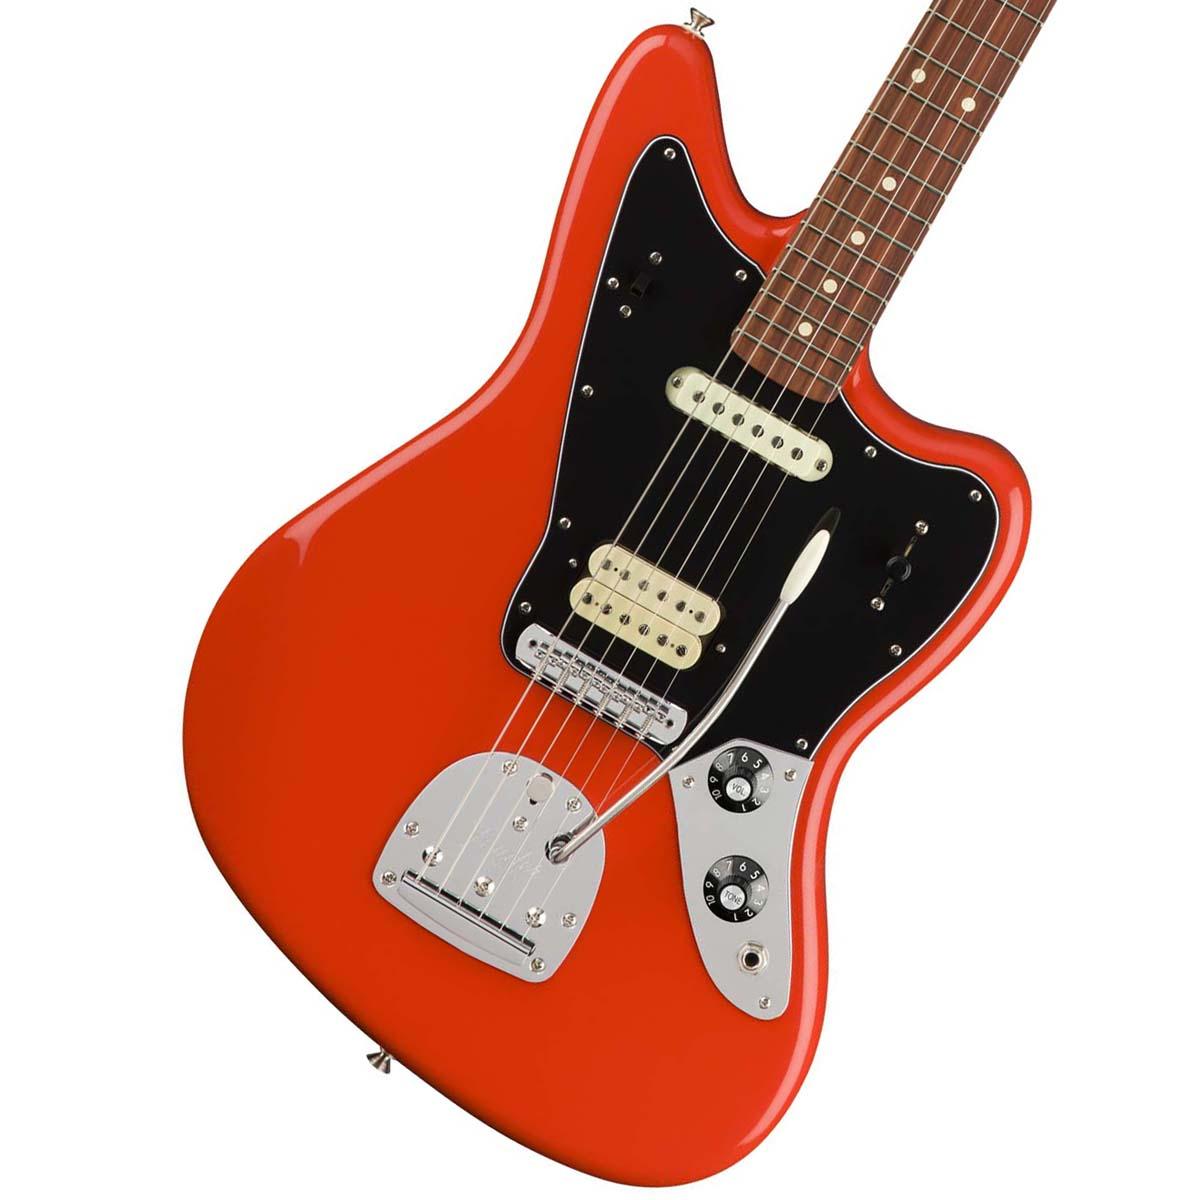 Fender / Player Series Jaguar Sonic Red Pau Ferro《数量限定!FenderアンプFRONTMAN10Gもセット!/+591355890》【YRK】